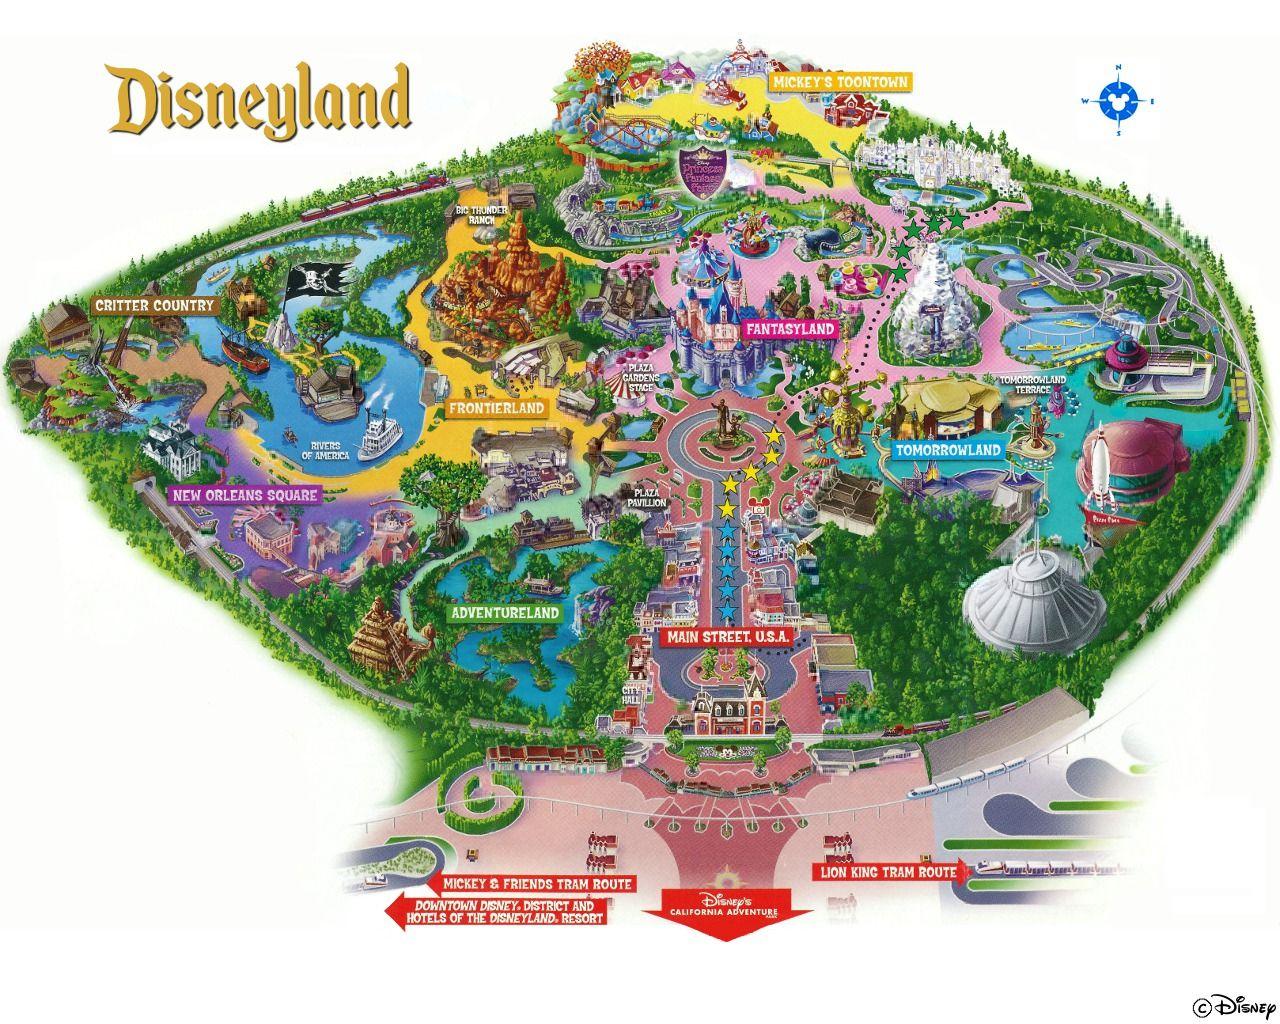 17 Best ideas about Disneyland Map on Pinterest | Disneyland hacks ...